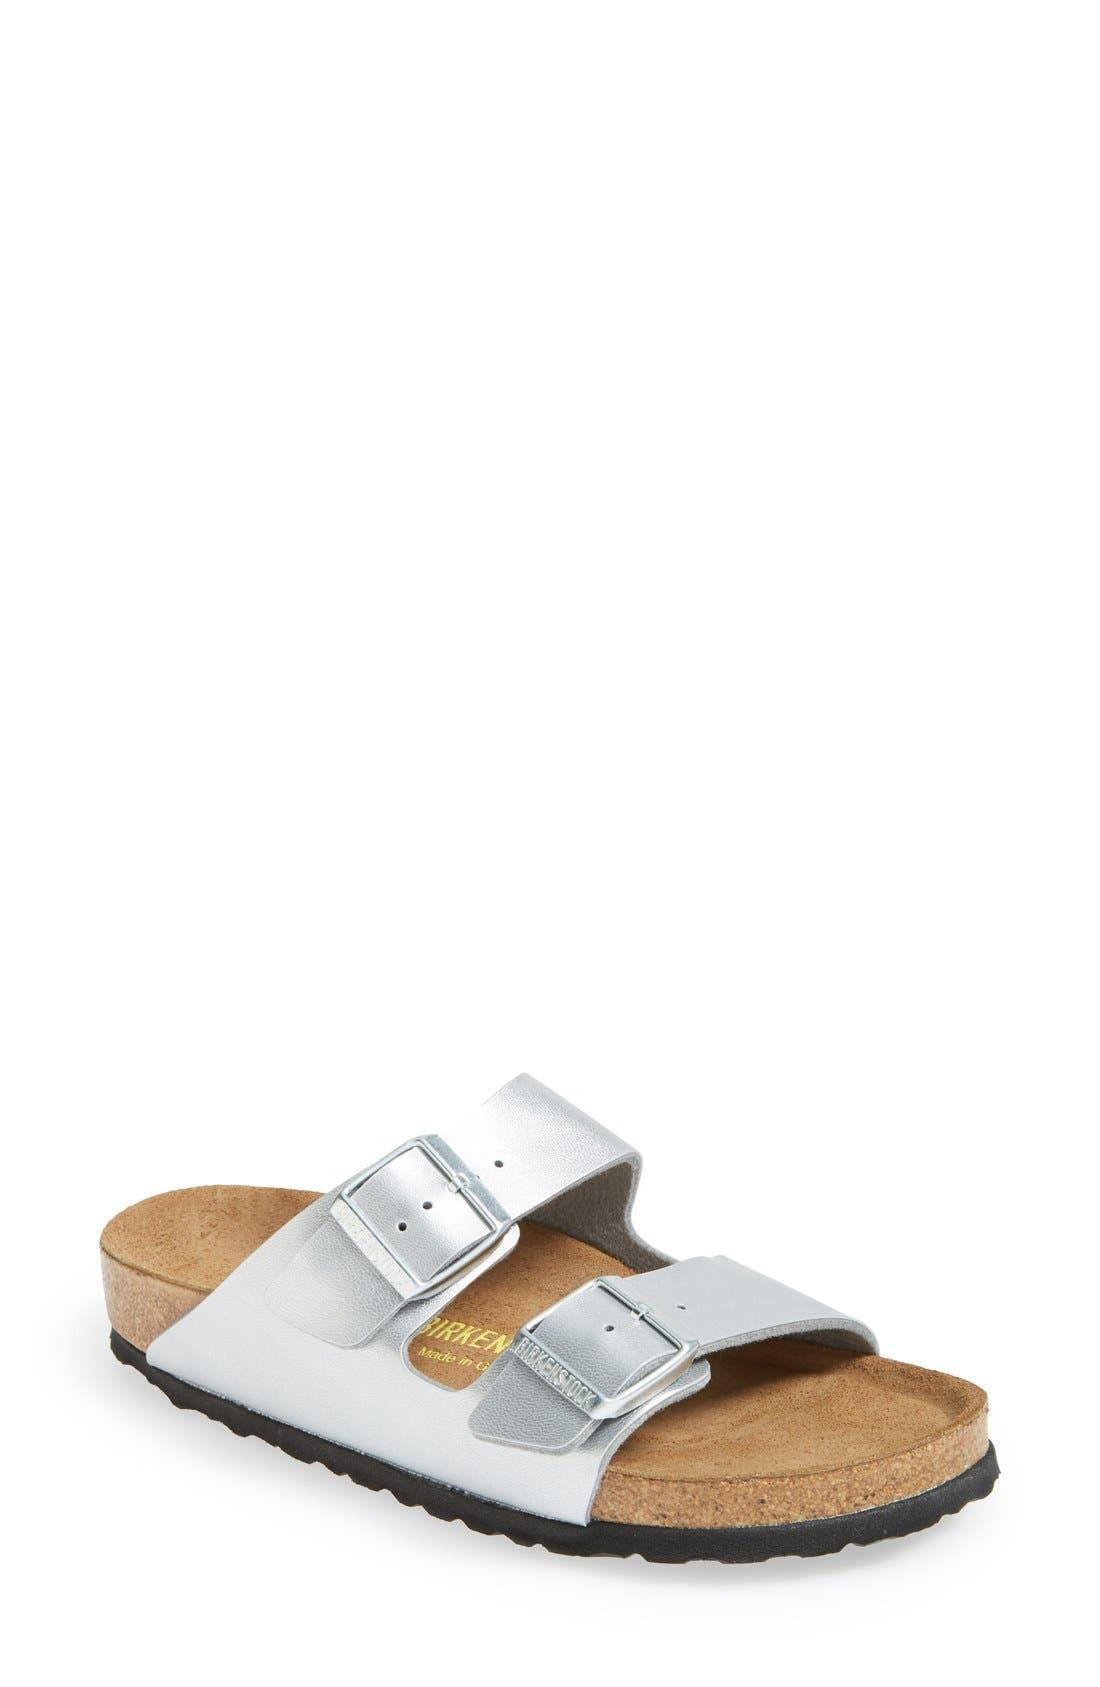 Main Image - Birkenstock 'Arizona Birko-Flor' Soft Footbed Sandal (Women)